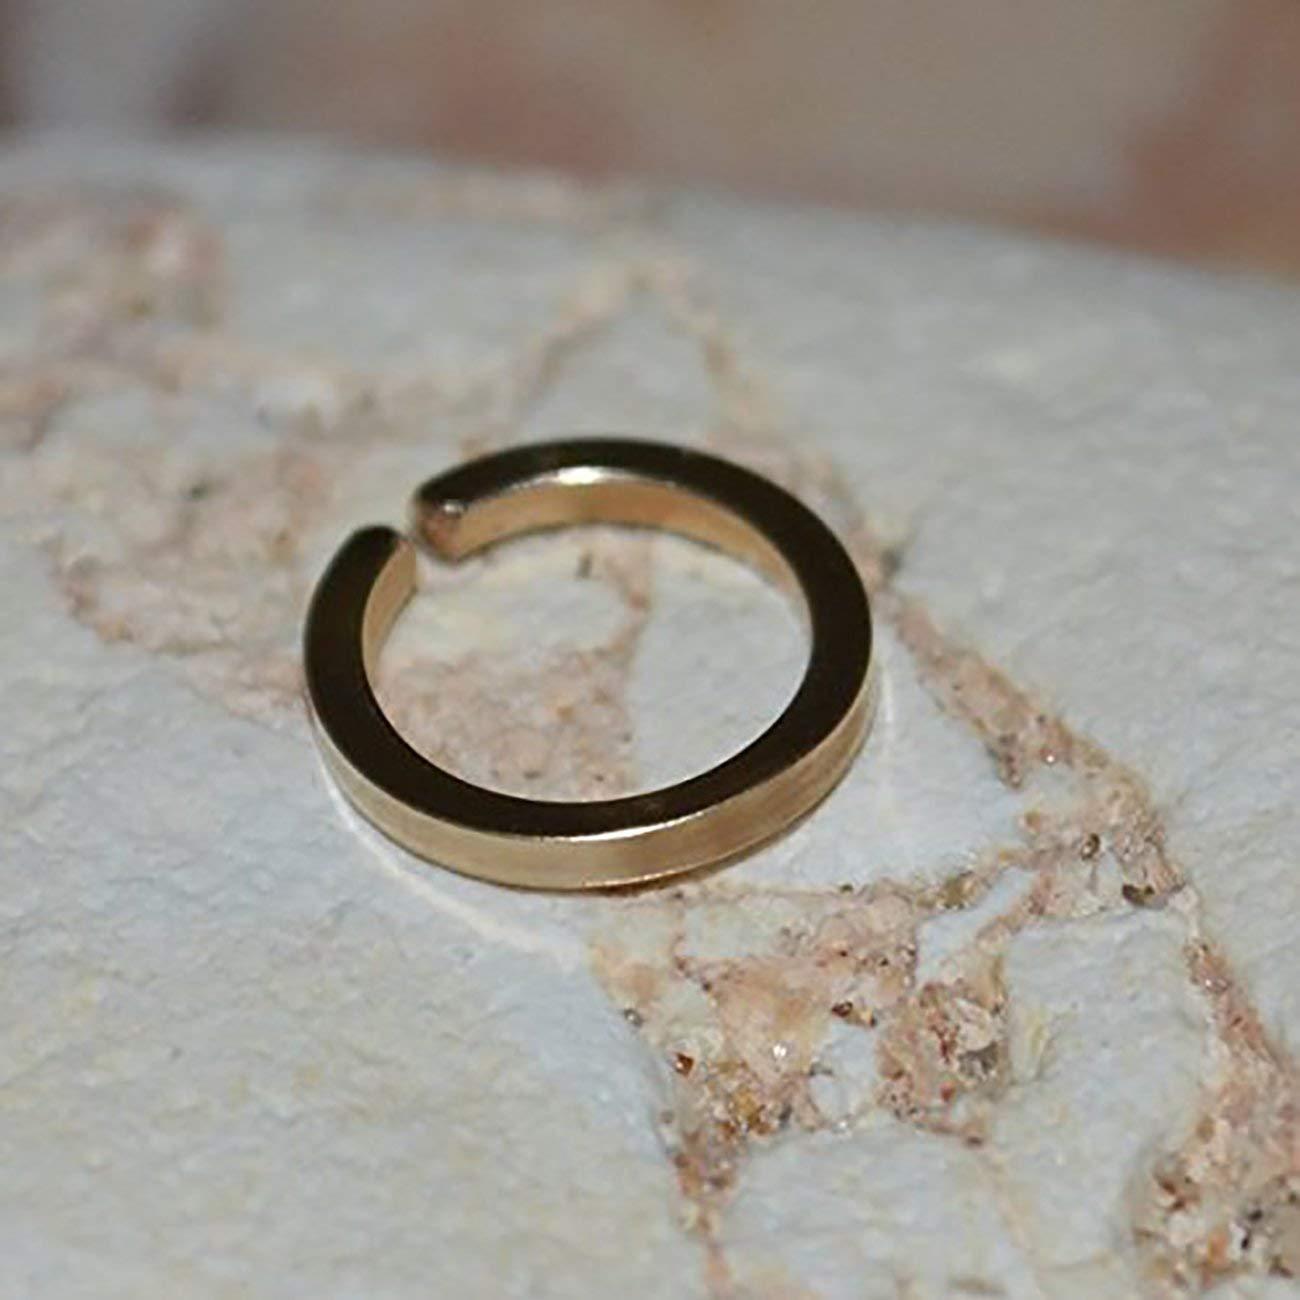 Septum Ring - Gold Nose Ring - Septum Piercing - Septum Jewelry - Tragus Earring - Nipple Ring 18 Gauge